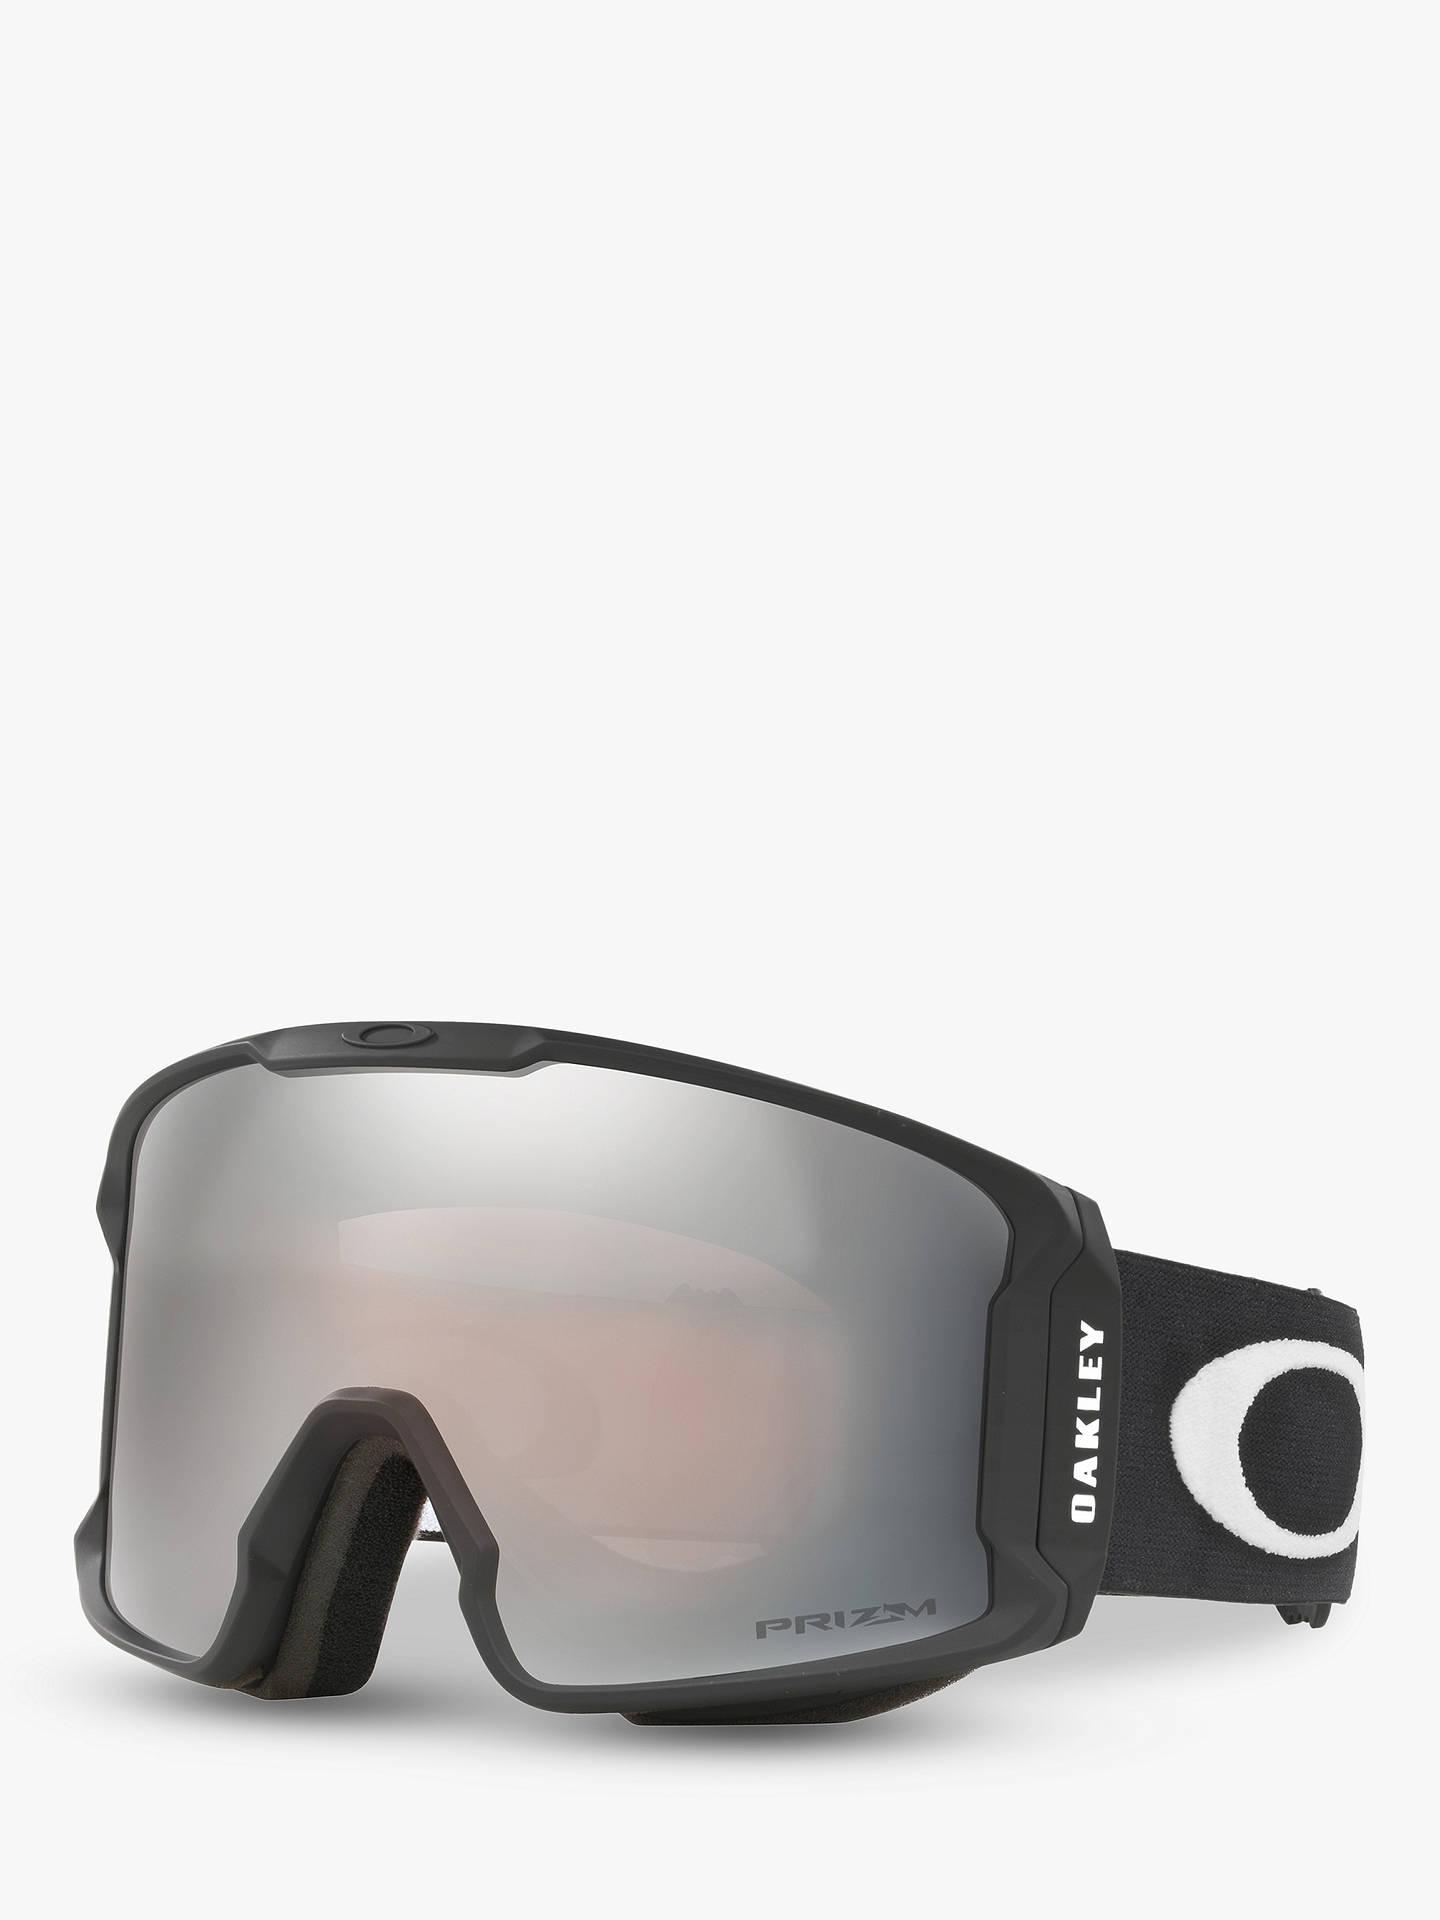 4735800fe6932 Buy Oakley OO7070 Men s Line Miner Prizm™ Snow Goggles